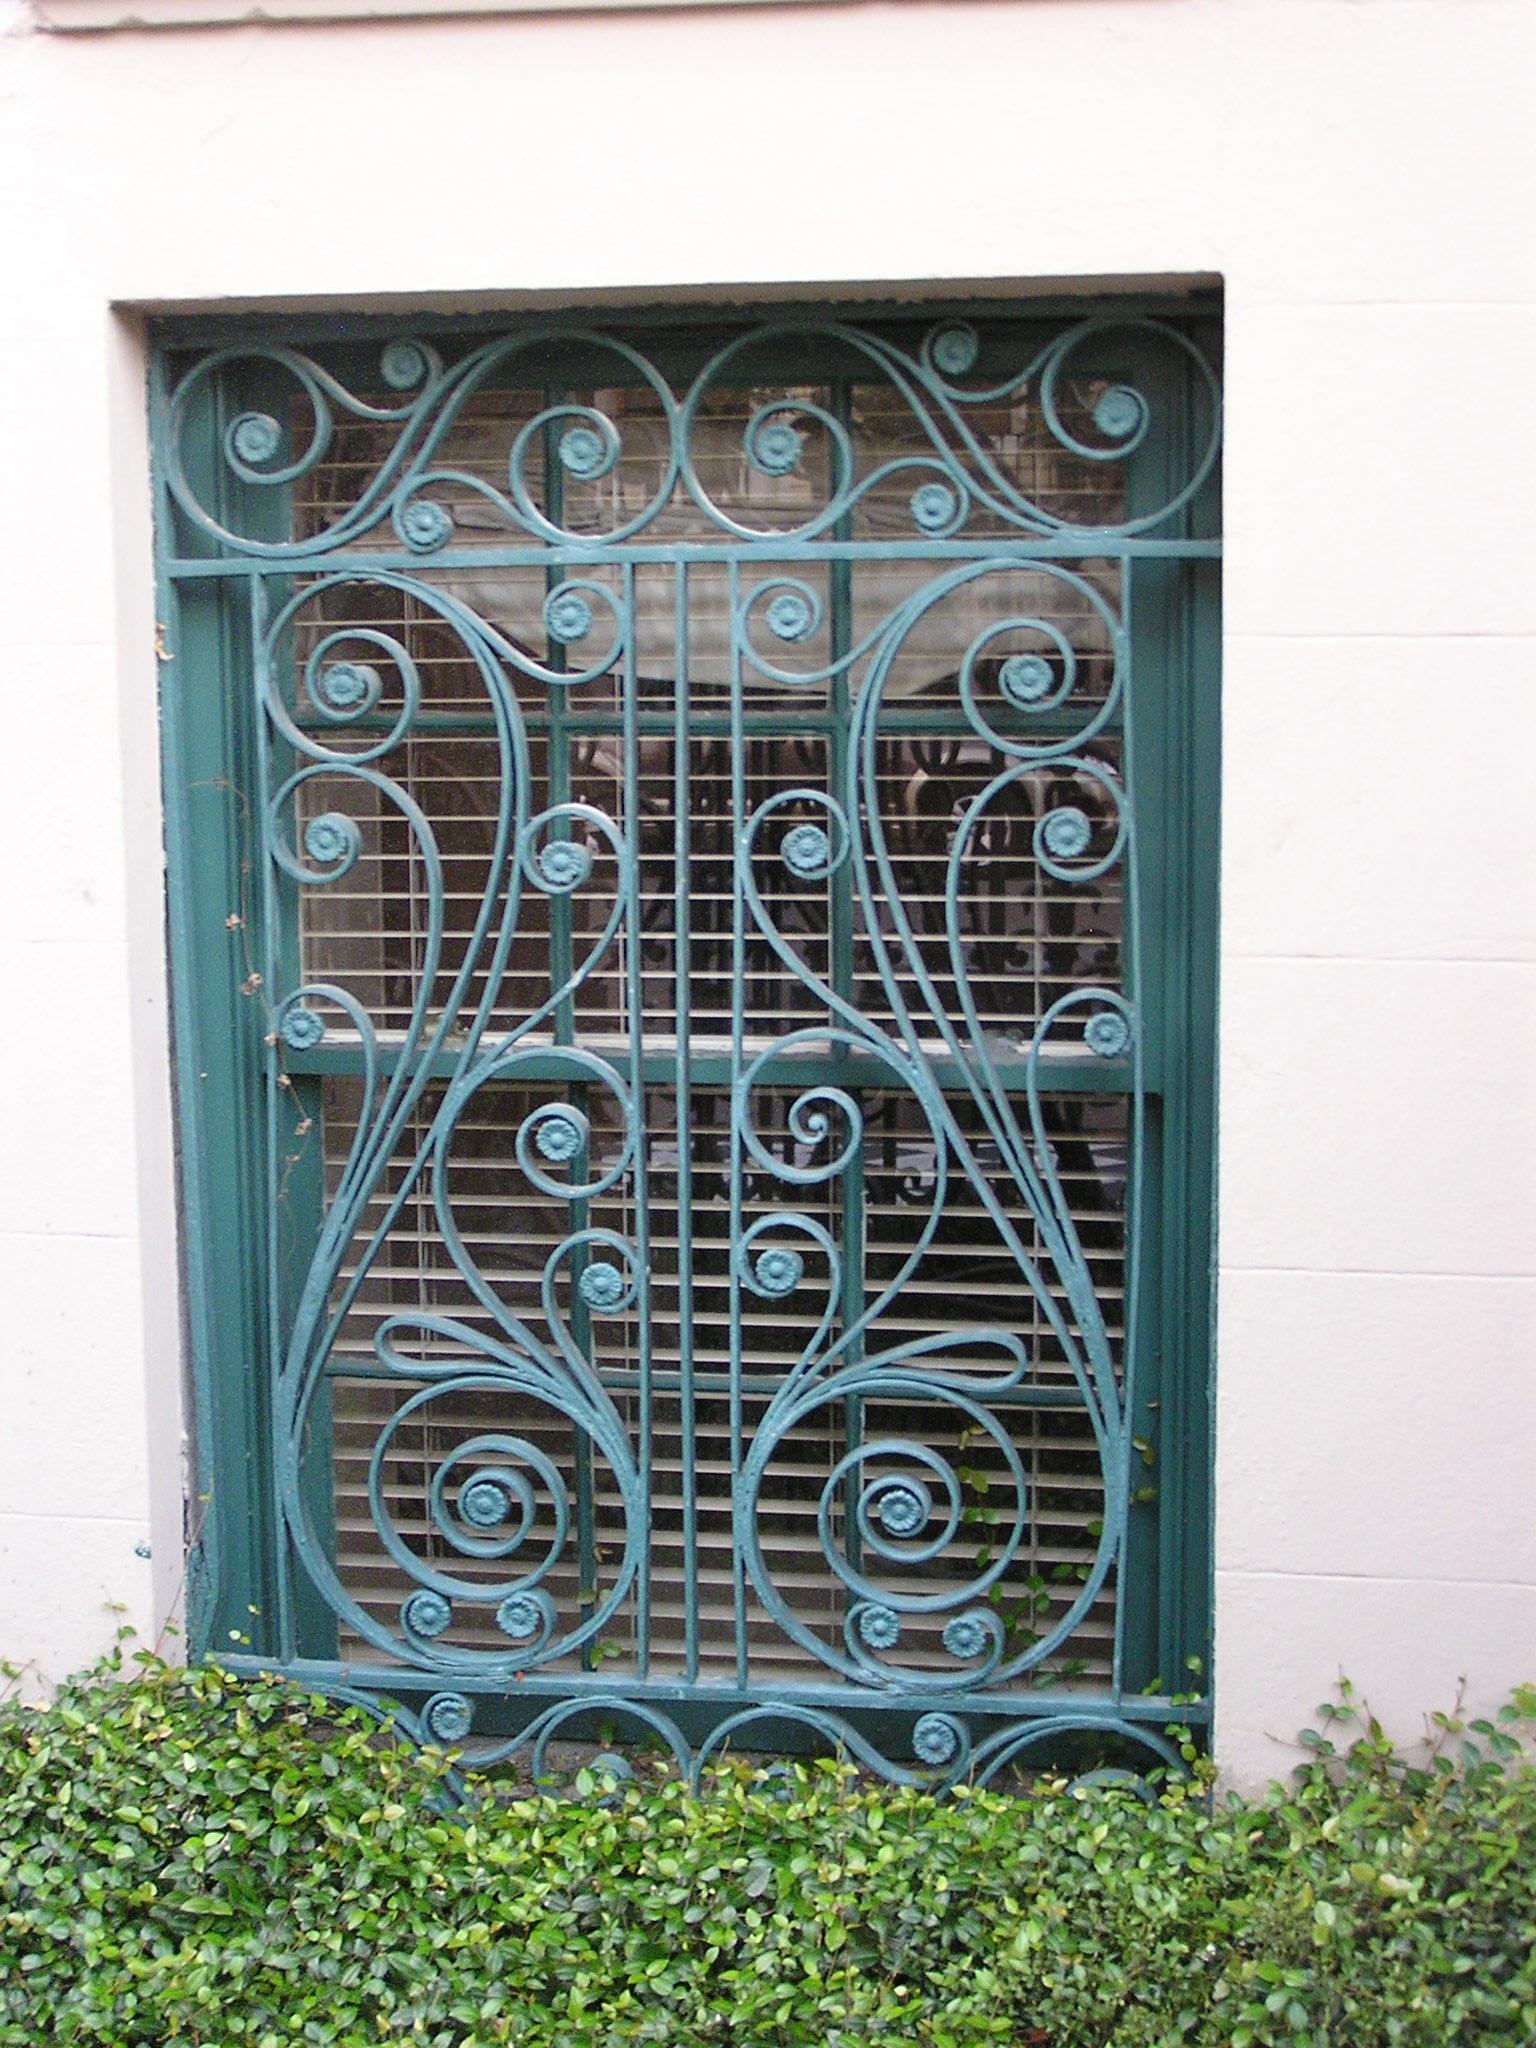 House window images - File Rudledge House Window Design Charleston Broad Street Jpg